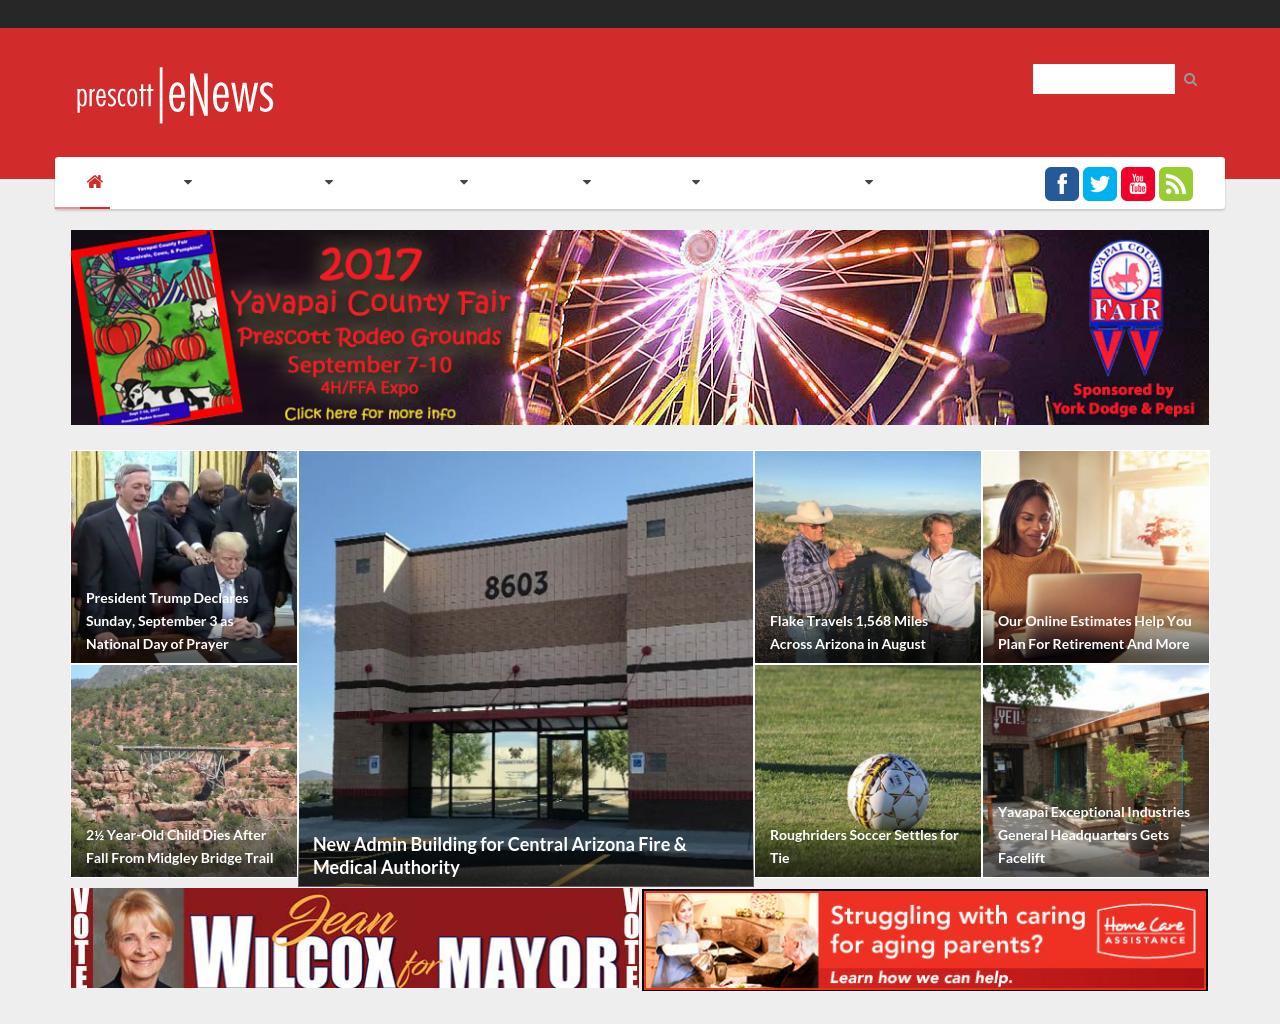 Prescott-eNews-Advertising-Reviews-Pricing